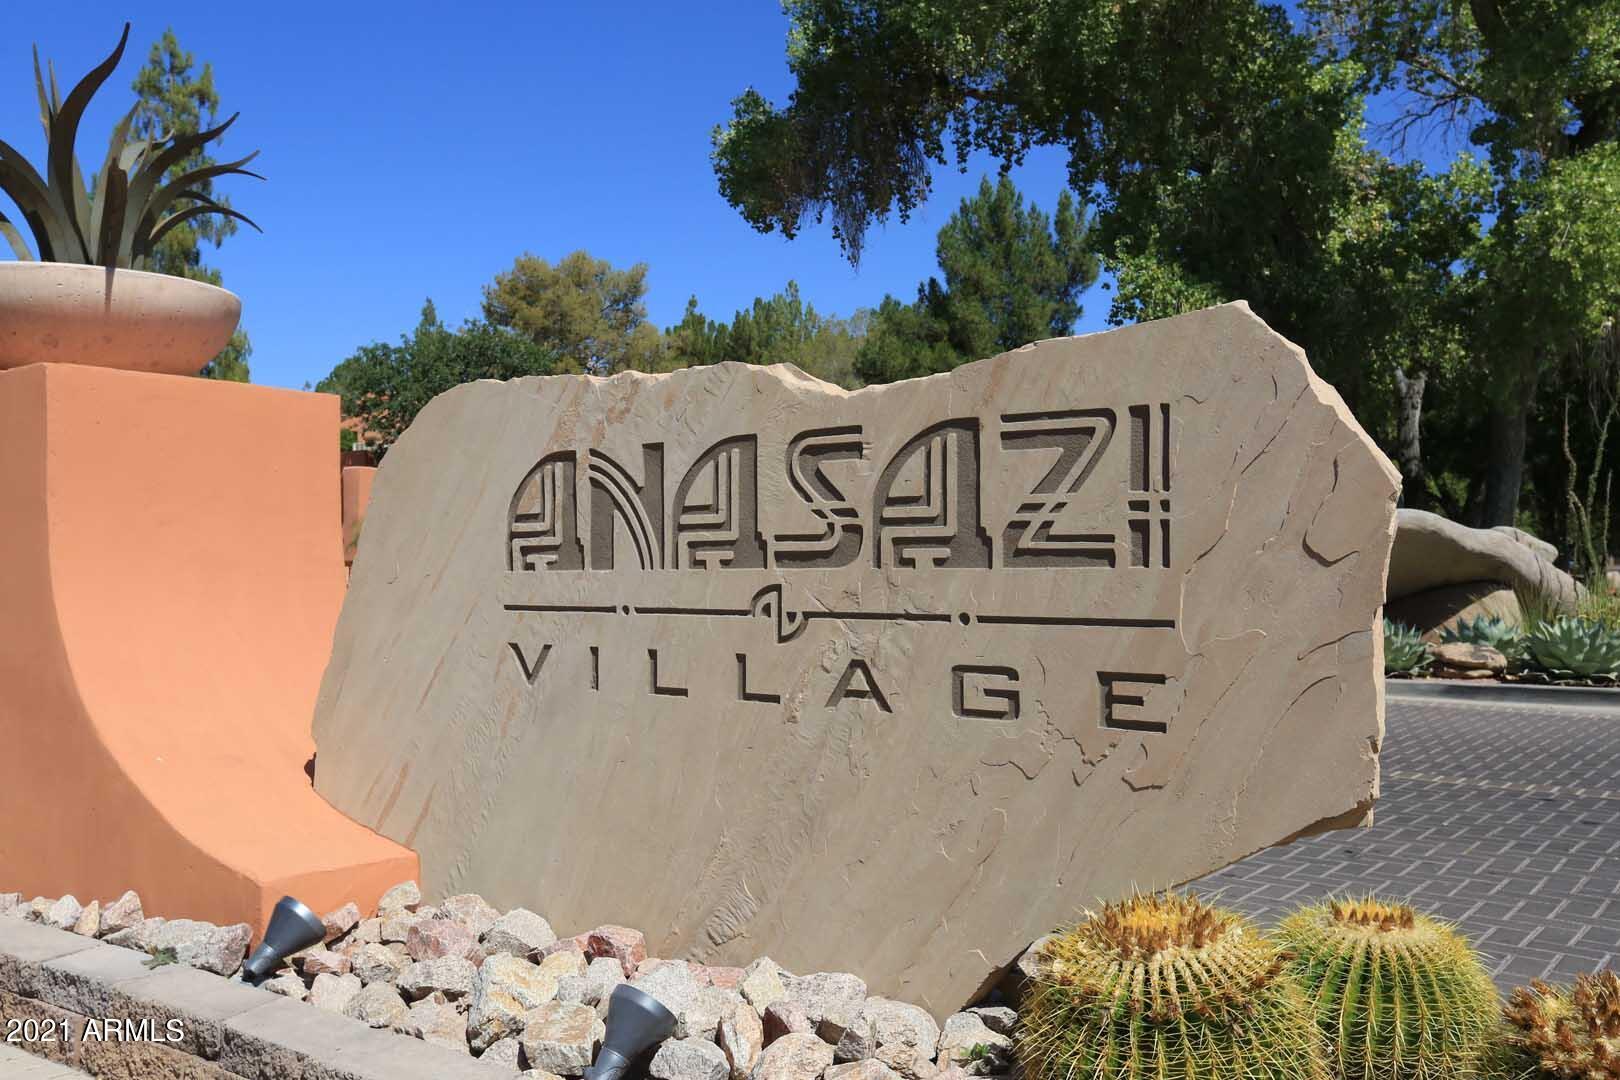 12222 N PARADISE VILLAGE Parkway S # 103, Phoenix, AZ 85032, 1 Bedroom Bedrooms, ,Residential Lease,For Rent,12222 N PARADISE VILLAGE Parkway S # 103,6291921